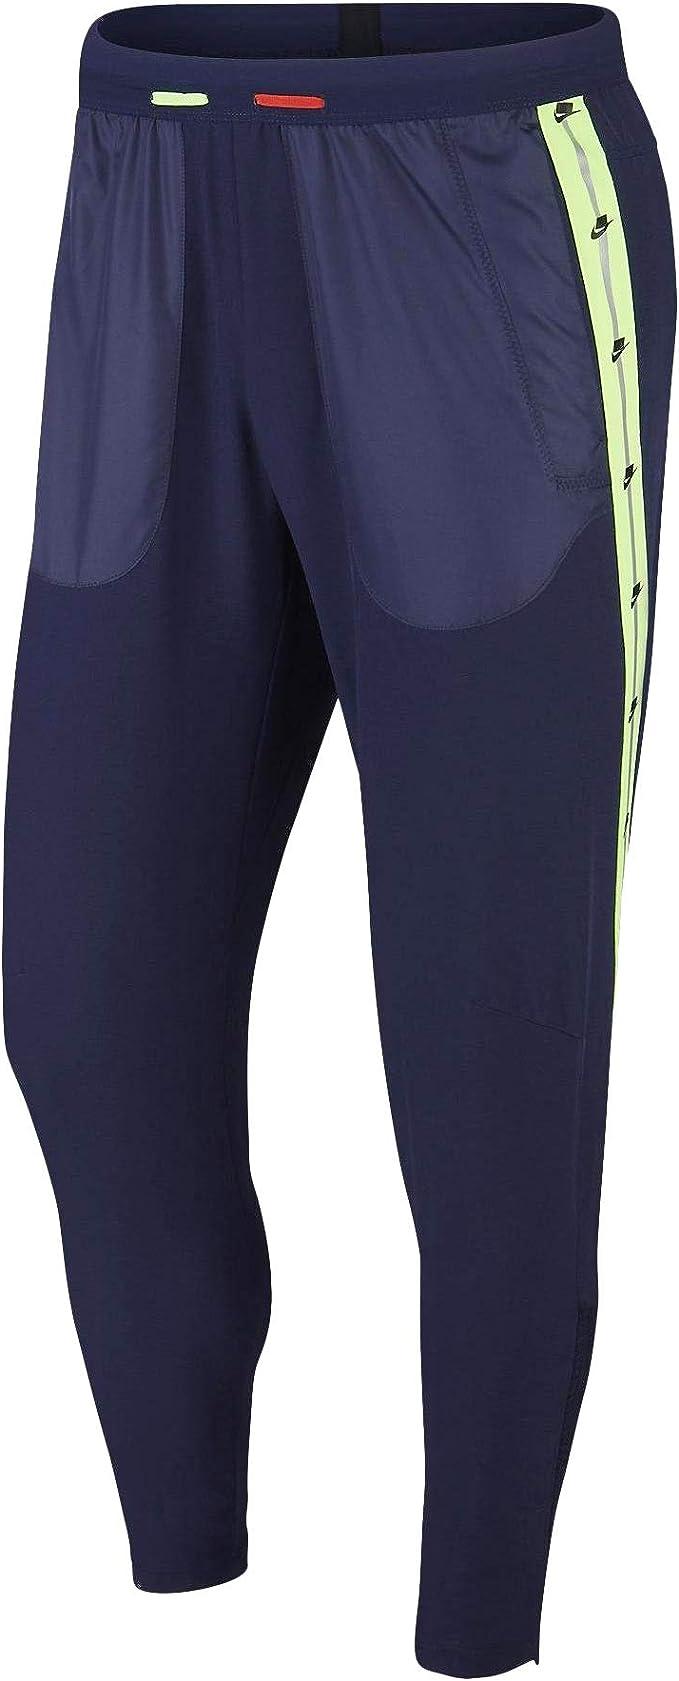 código Morse conveniencia Abuelo  Nike Wild Run Phenom Pants 2 Blackened Blue/Habanero Red SM at Amazon Men's  Clothing store